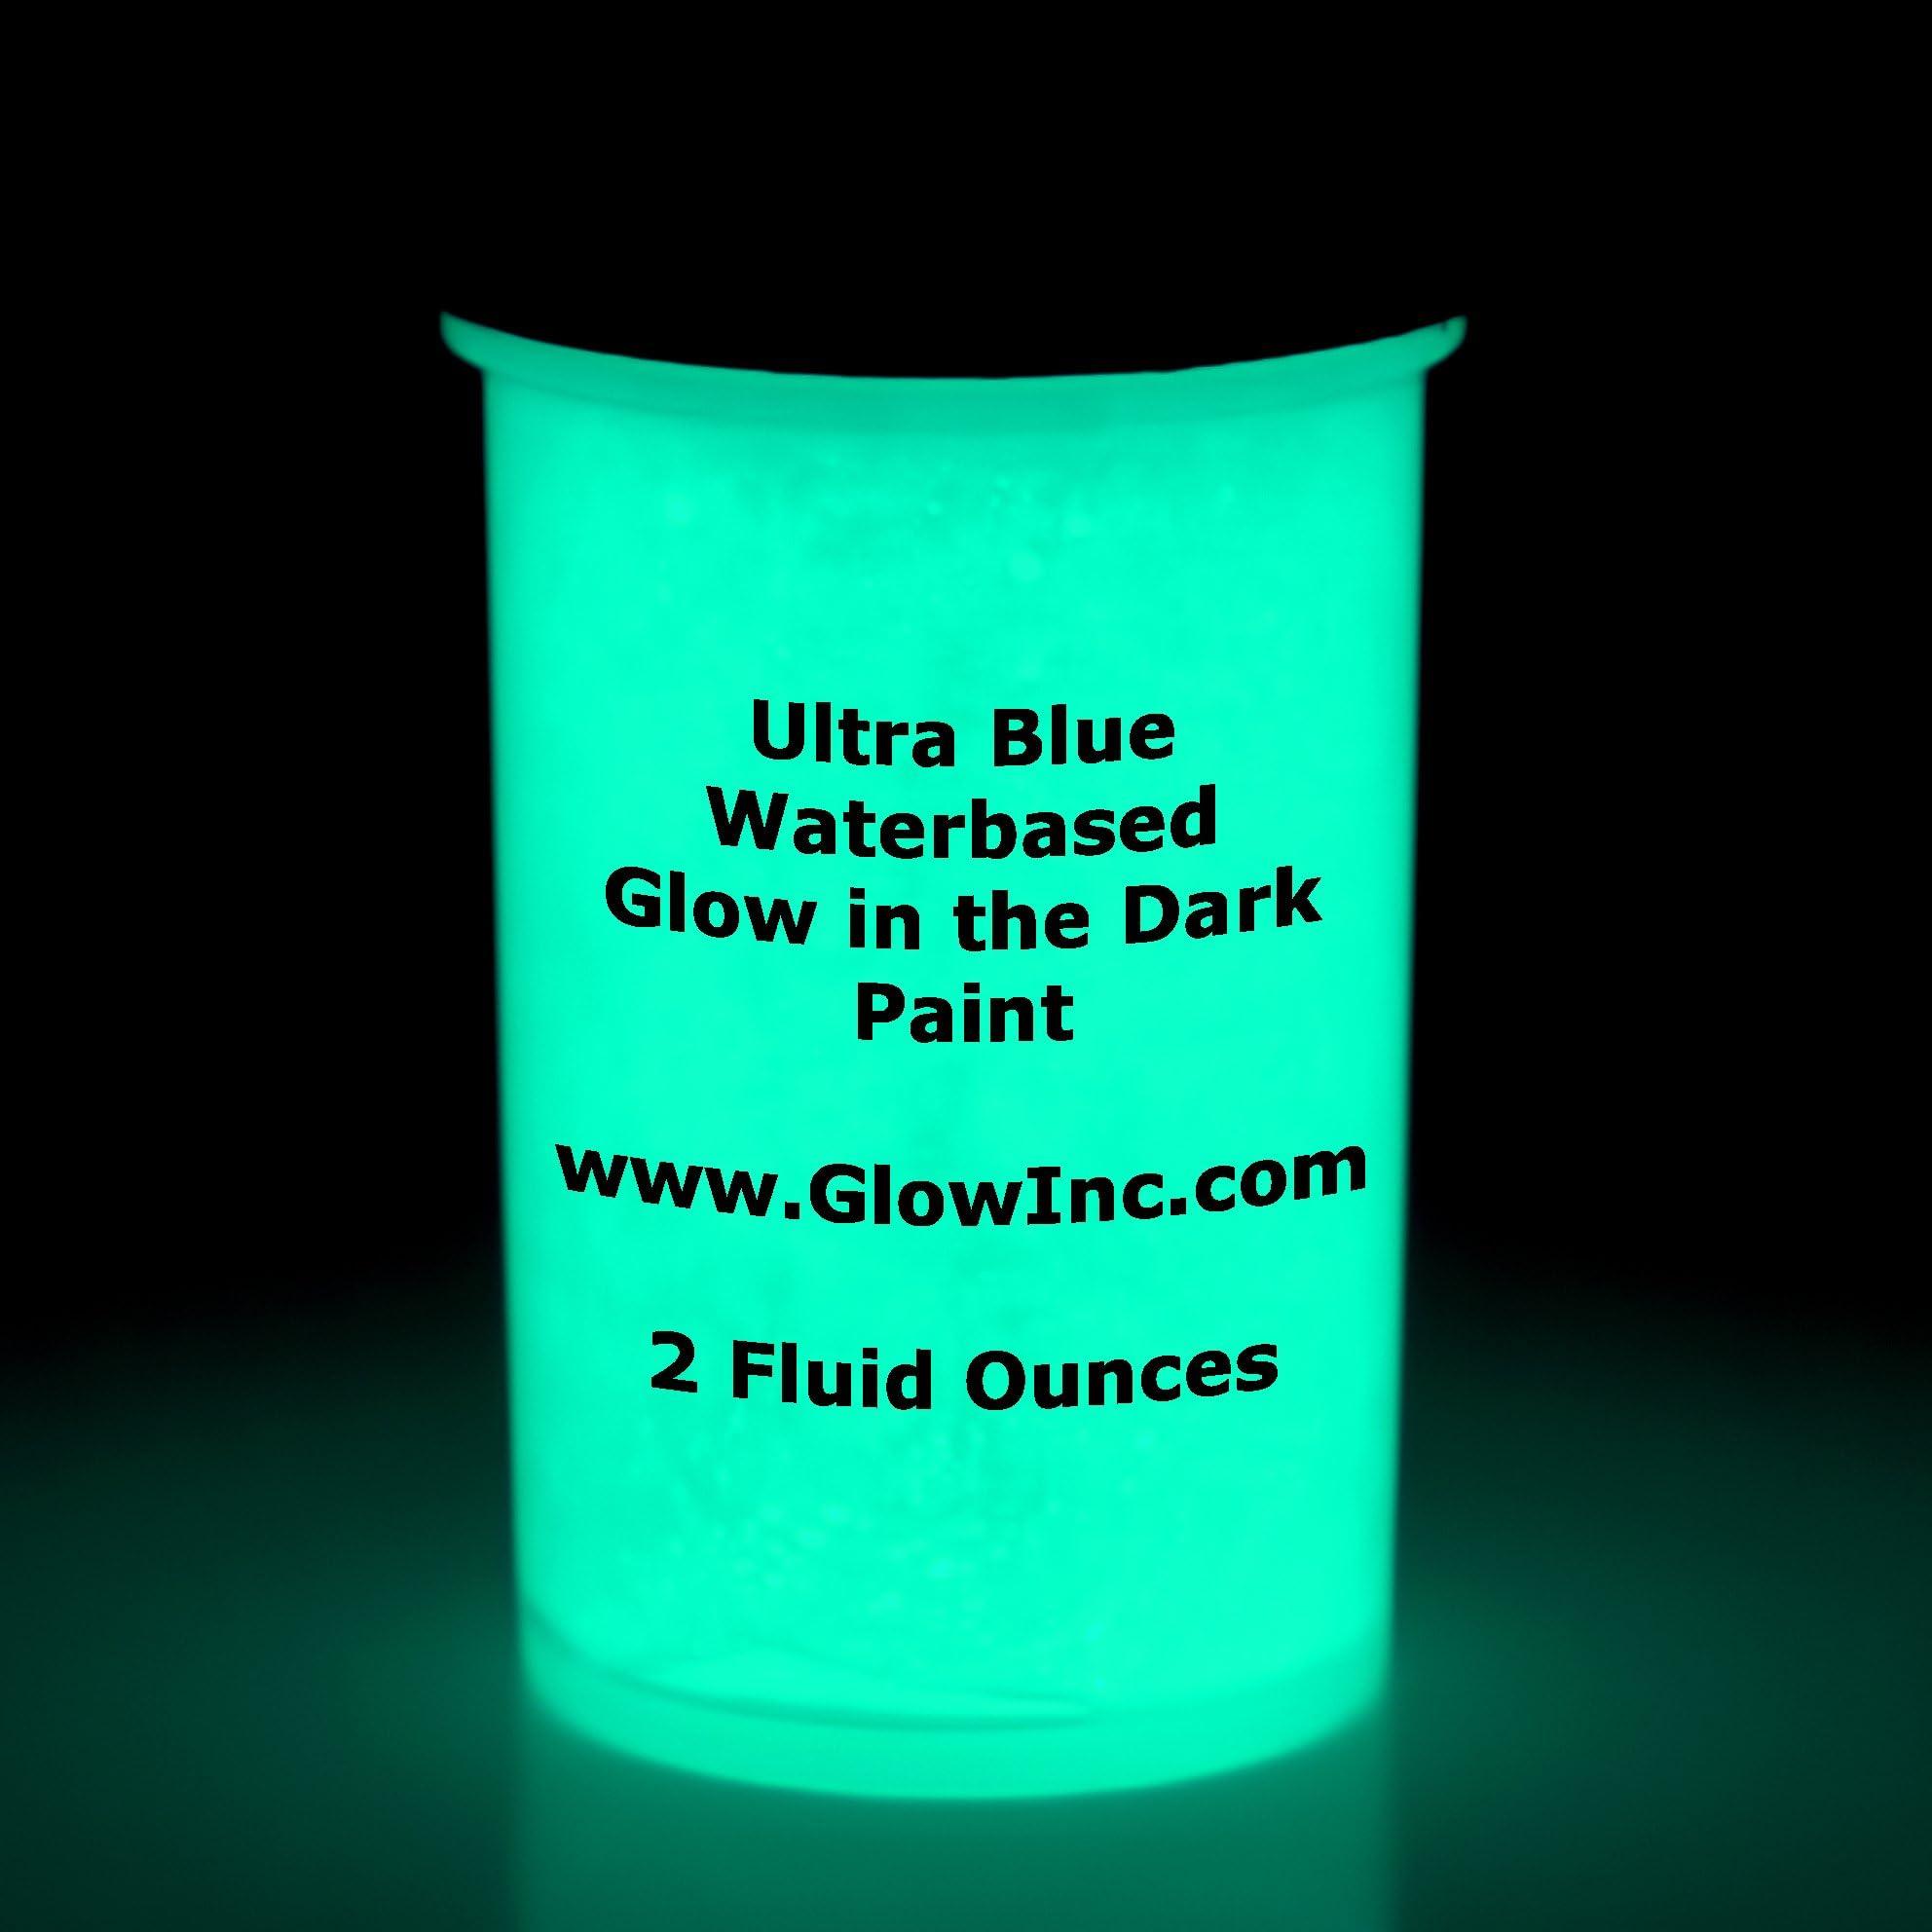 Ultra-blue water based glow in the dark paint by Glow Inc. 2oz